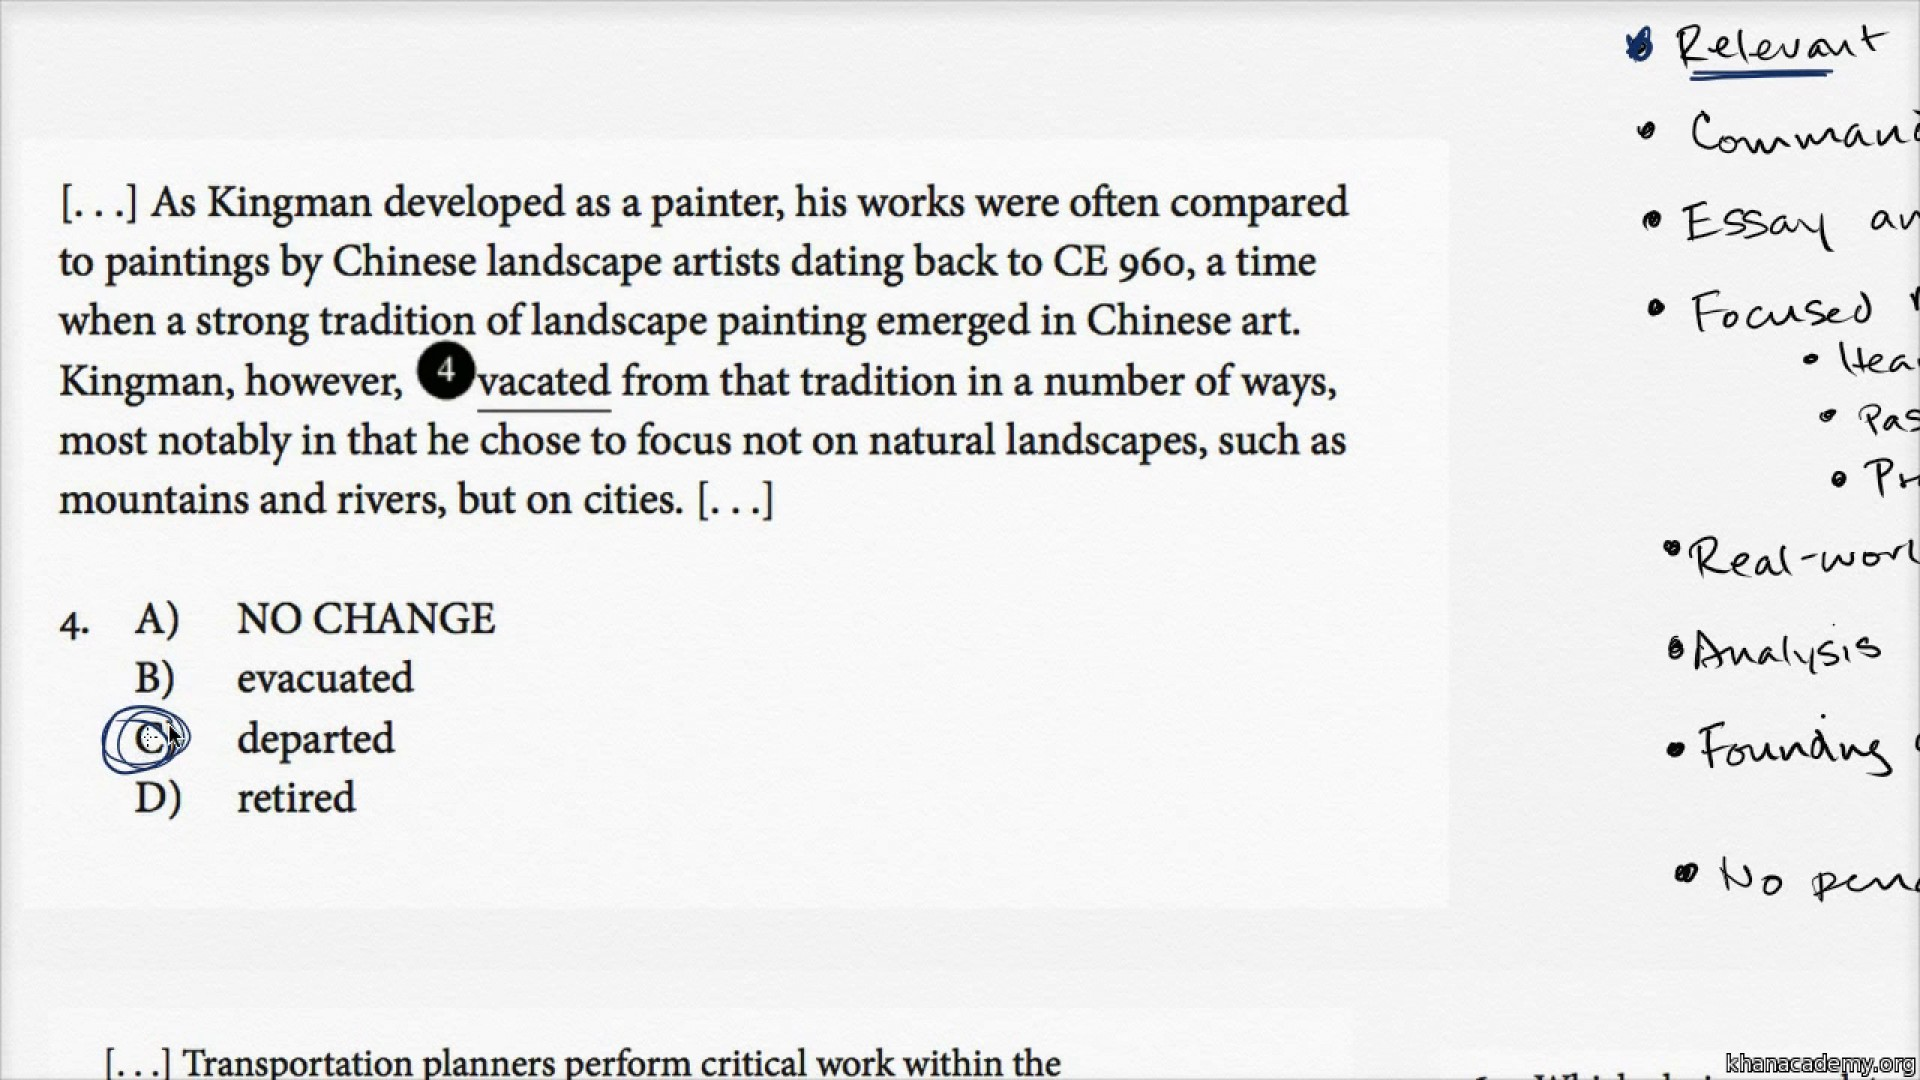 018 Does The Sat Essay Affect Your Score Example Rxjrhbs 21c Stupendous 2016 1920